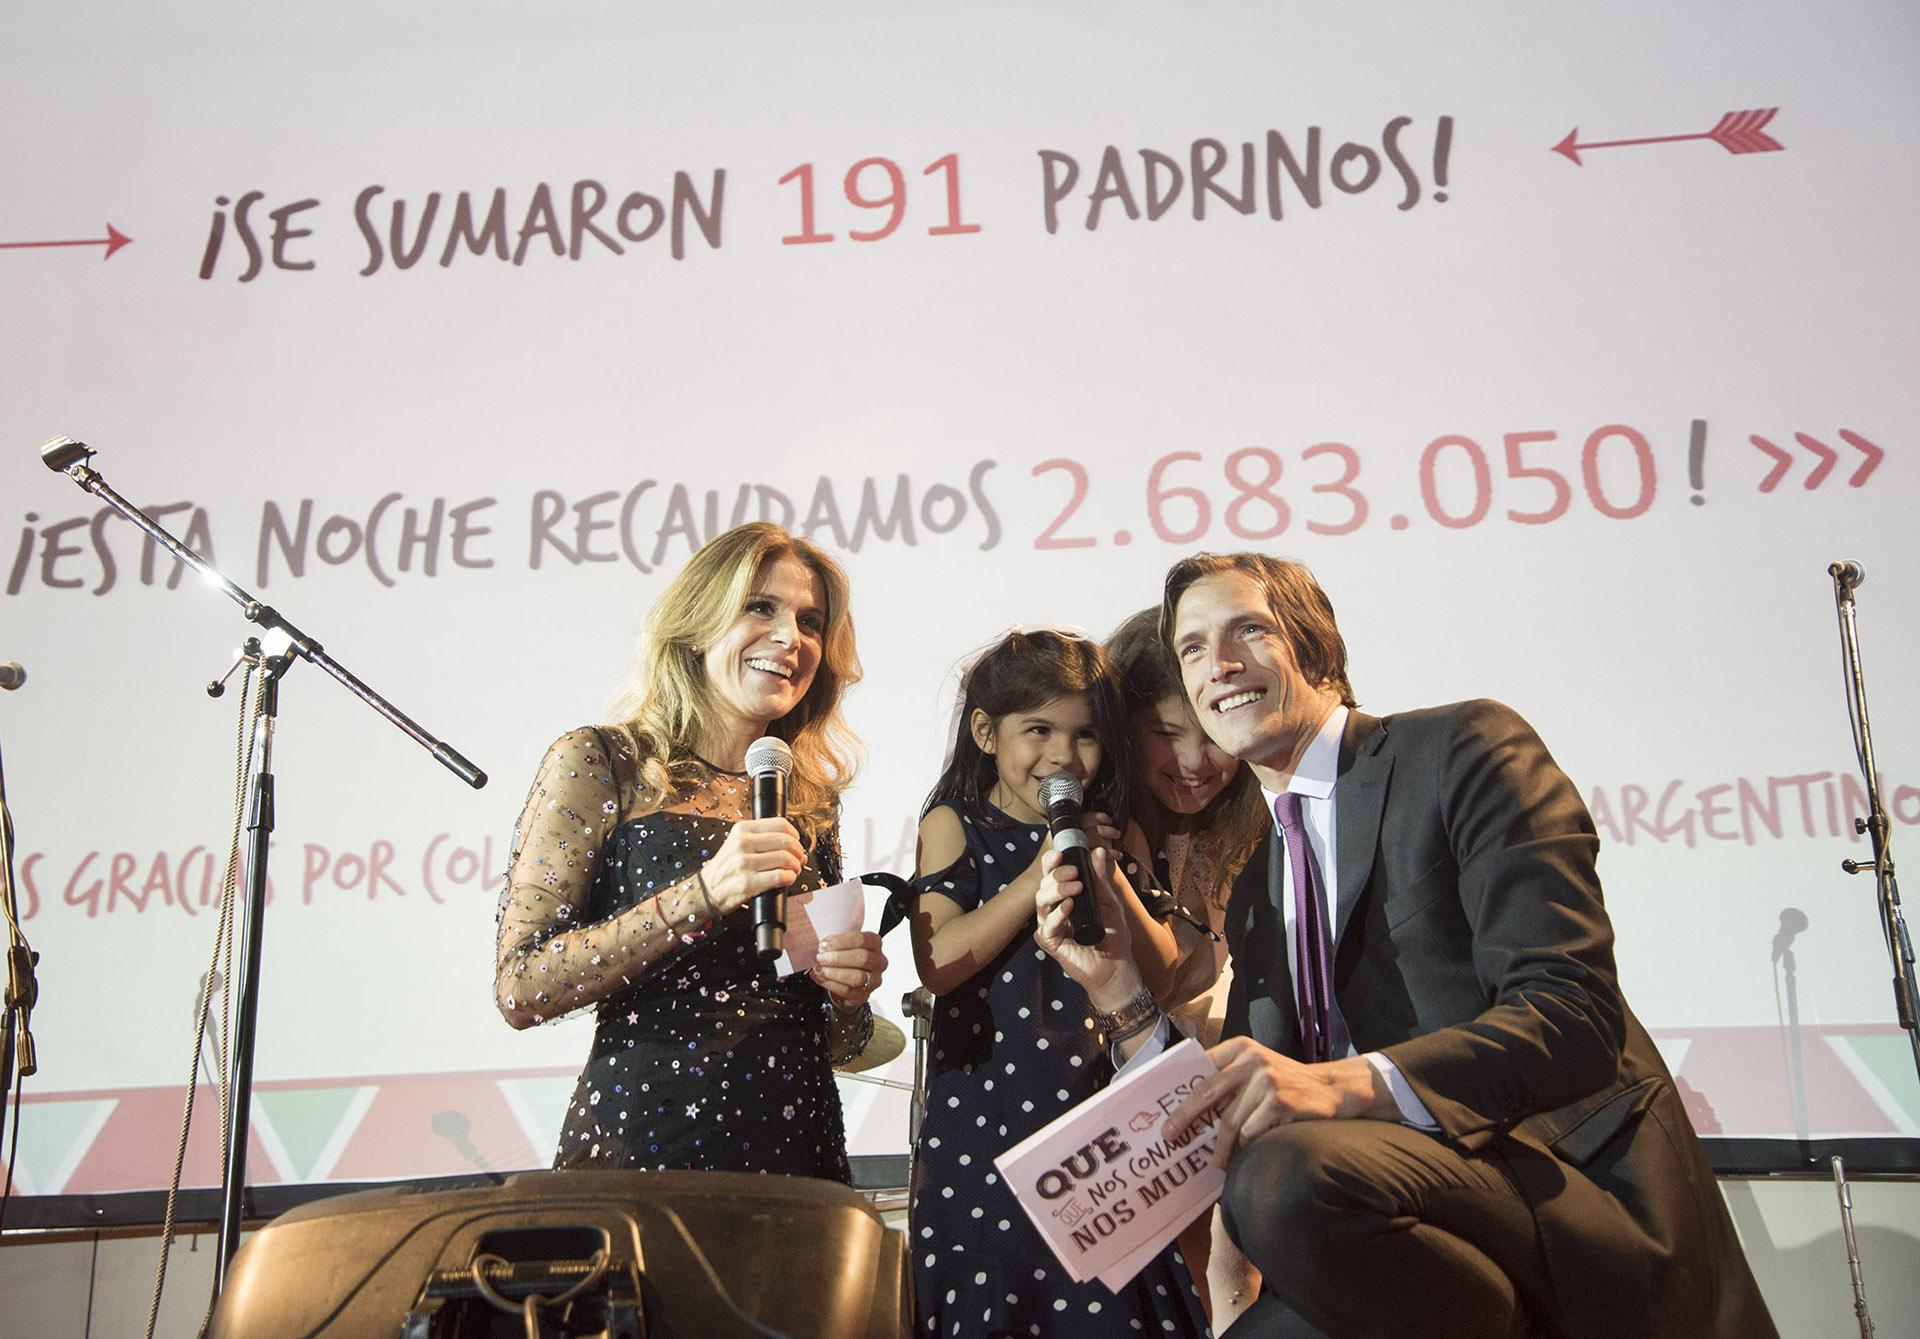 Flavia Palmiero e Iván De Pineda